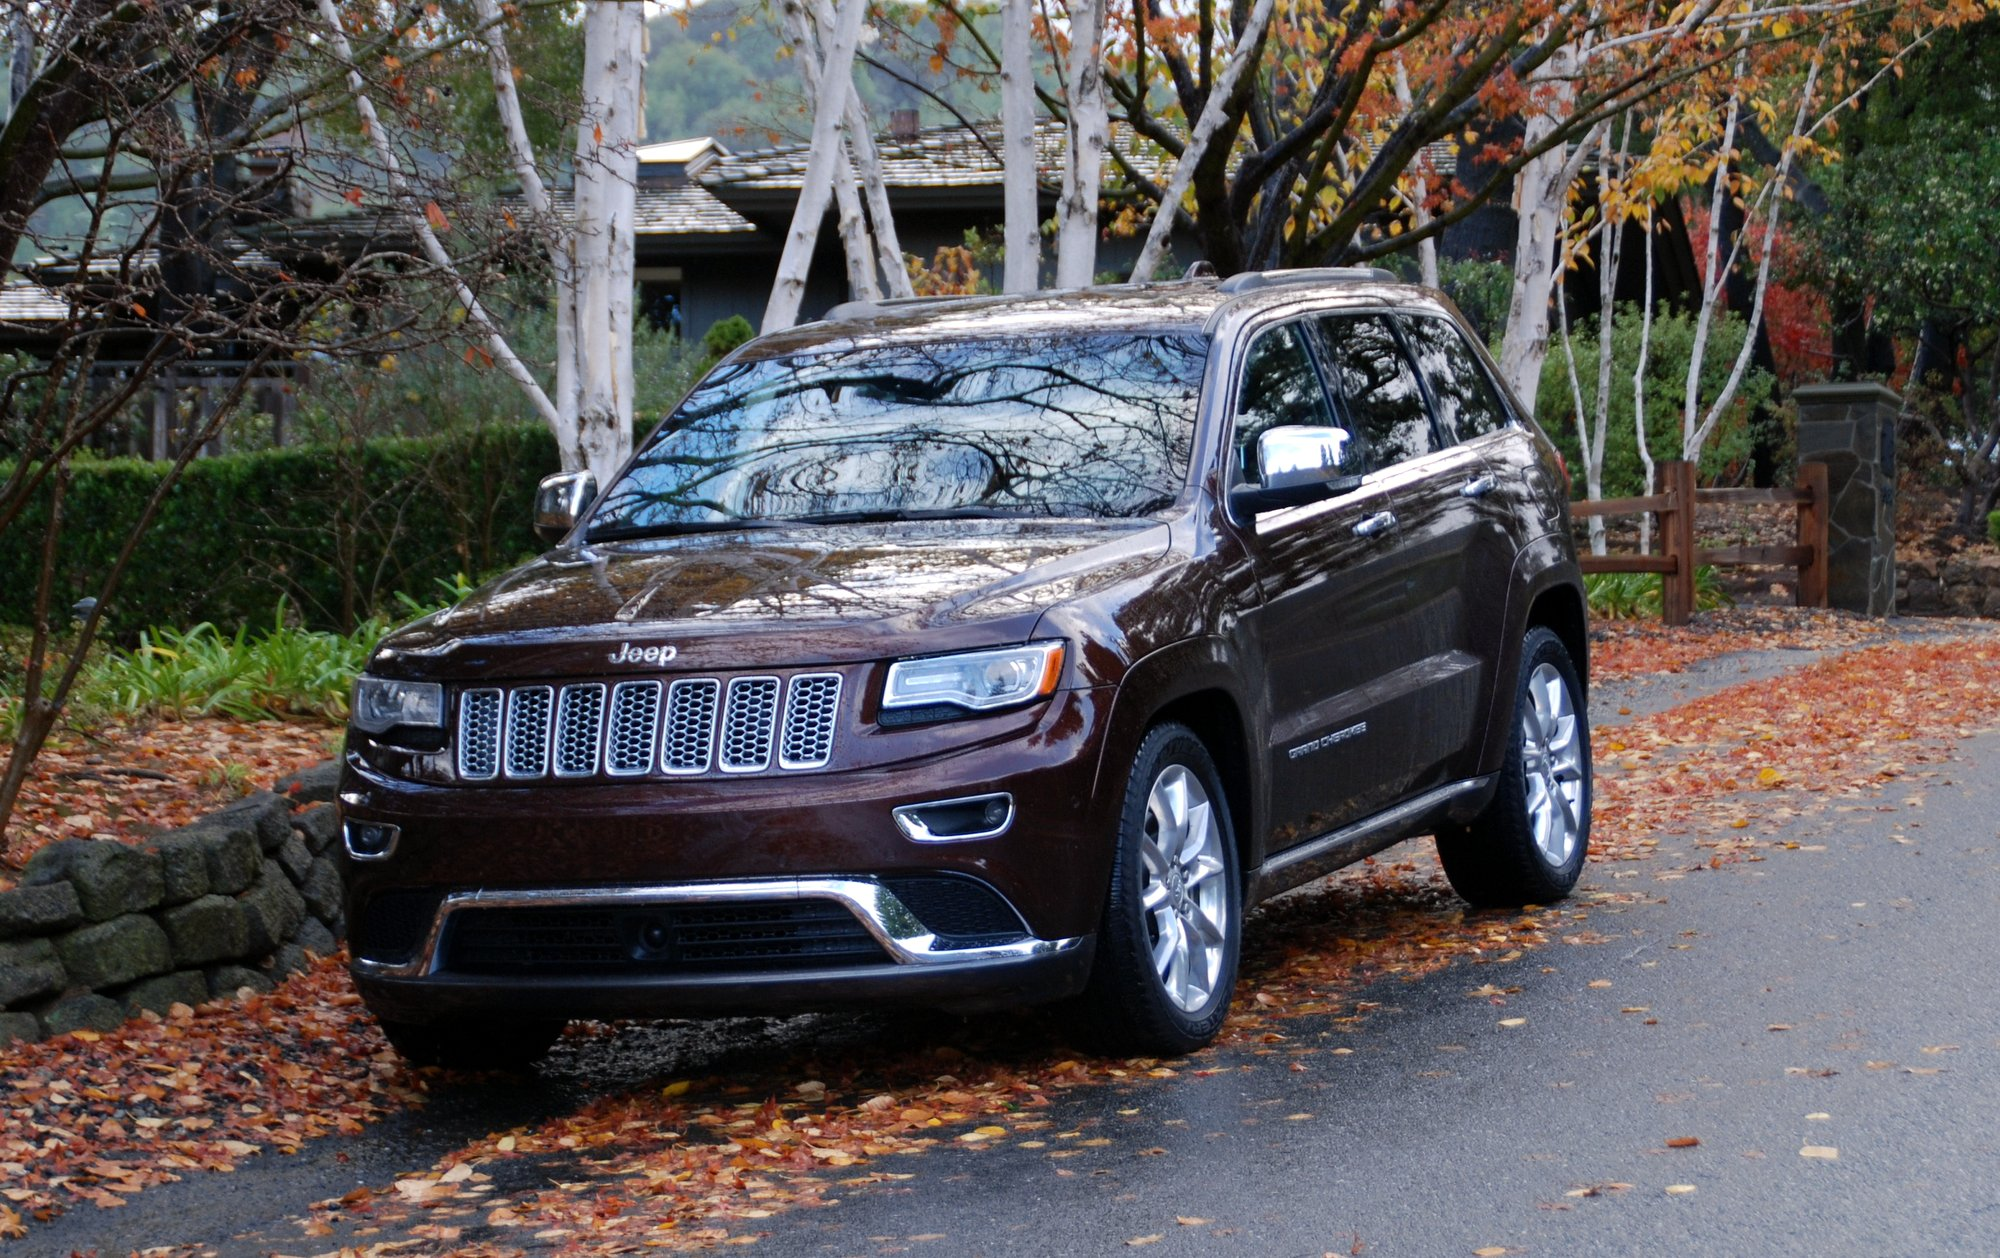 2014 Jeep, Grand Cherokee EcoDiesel,fuel Economy, Mpg